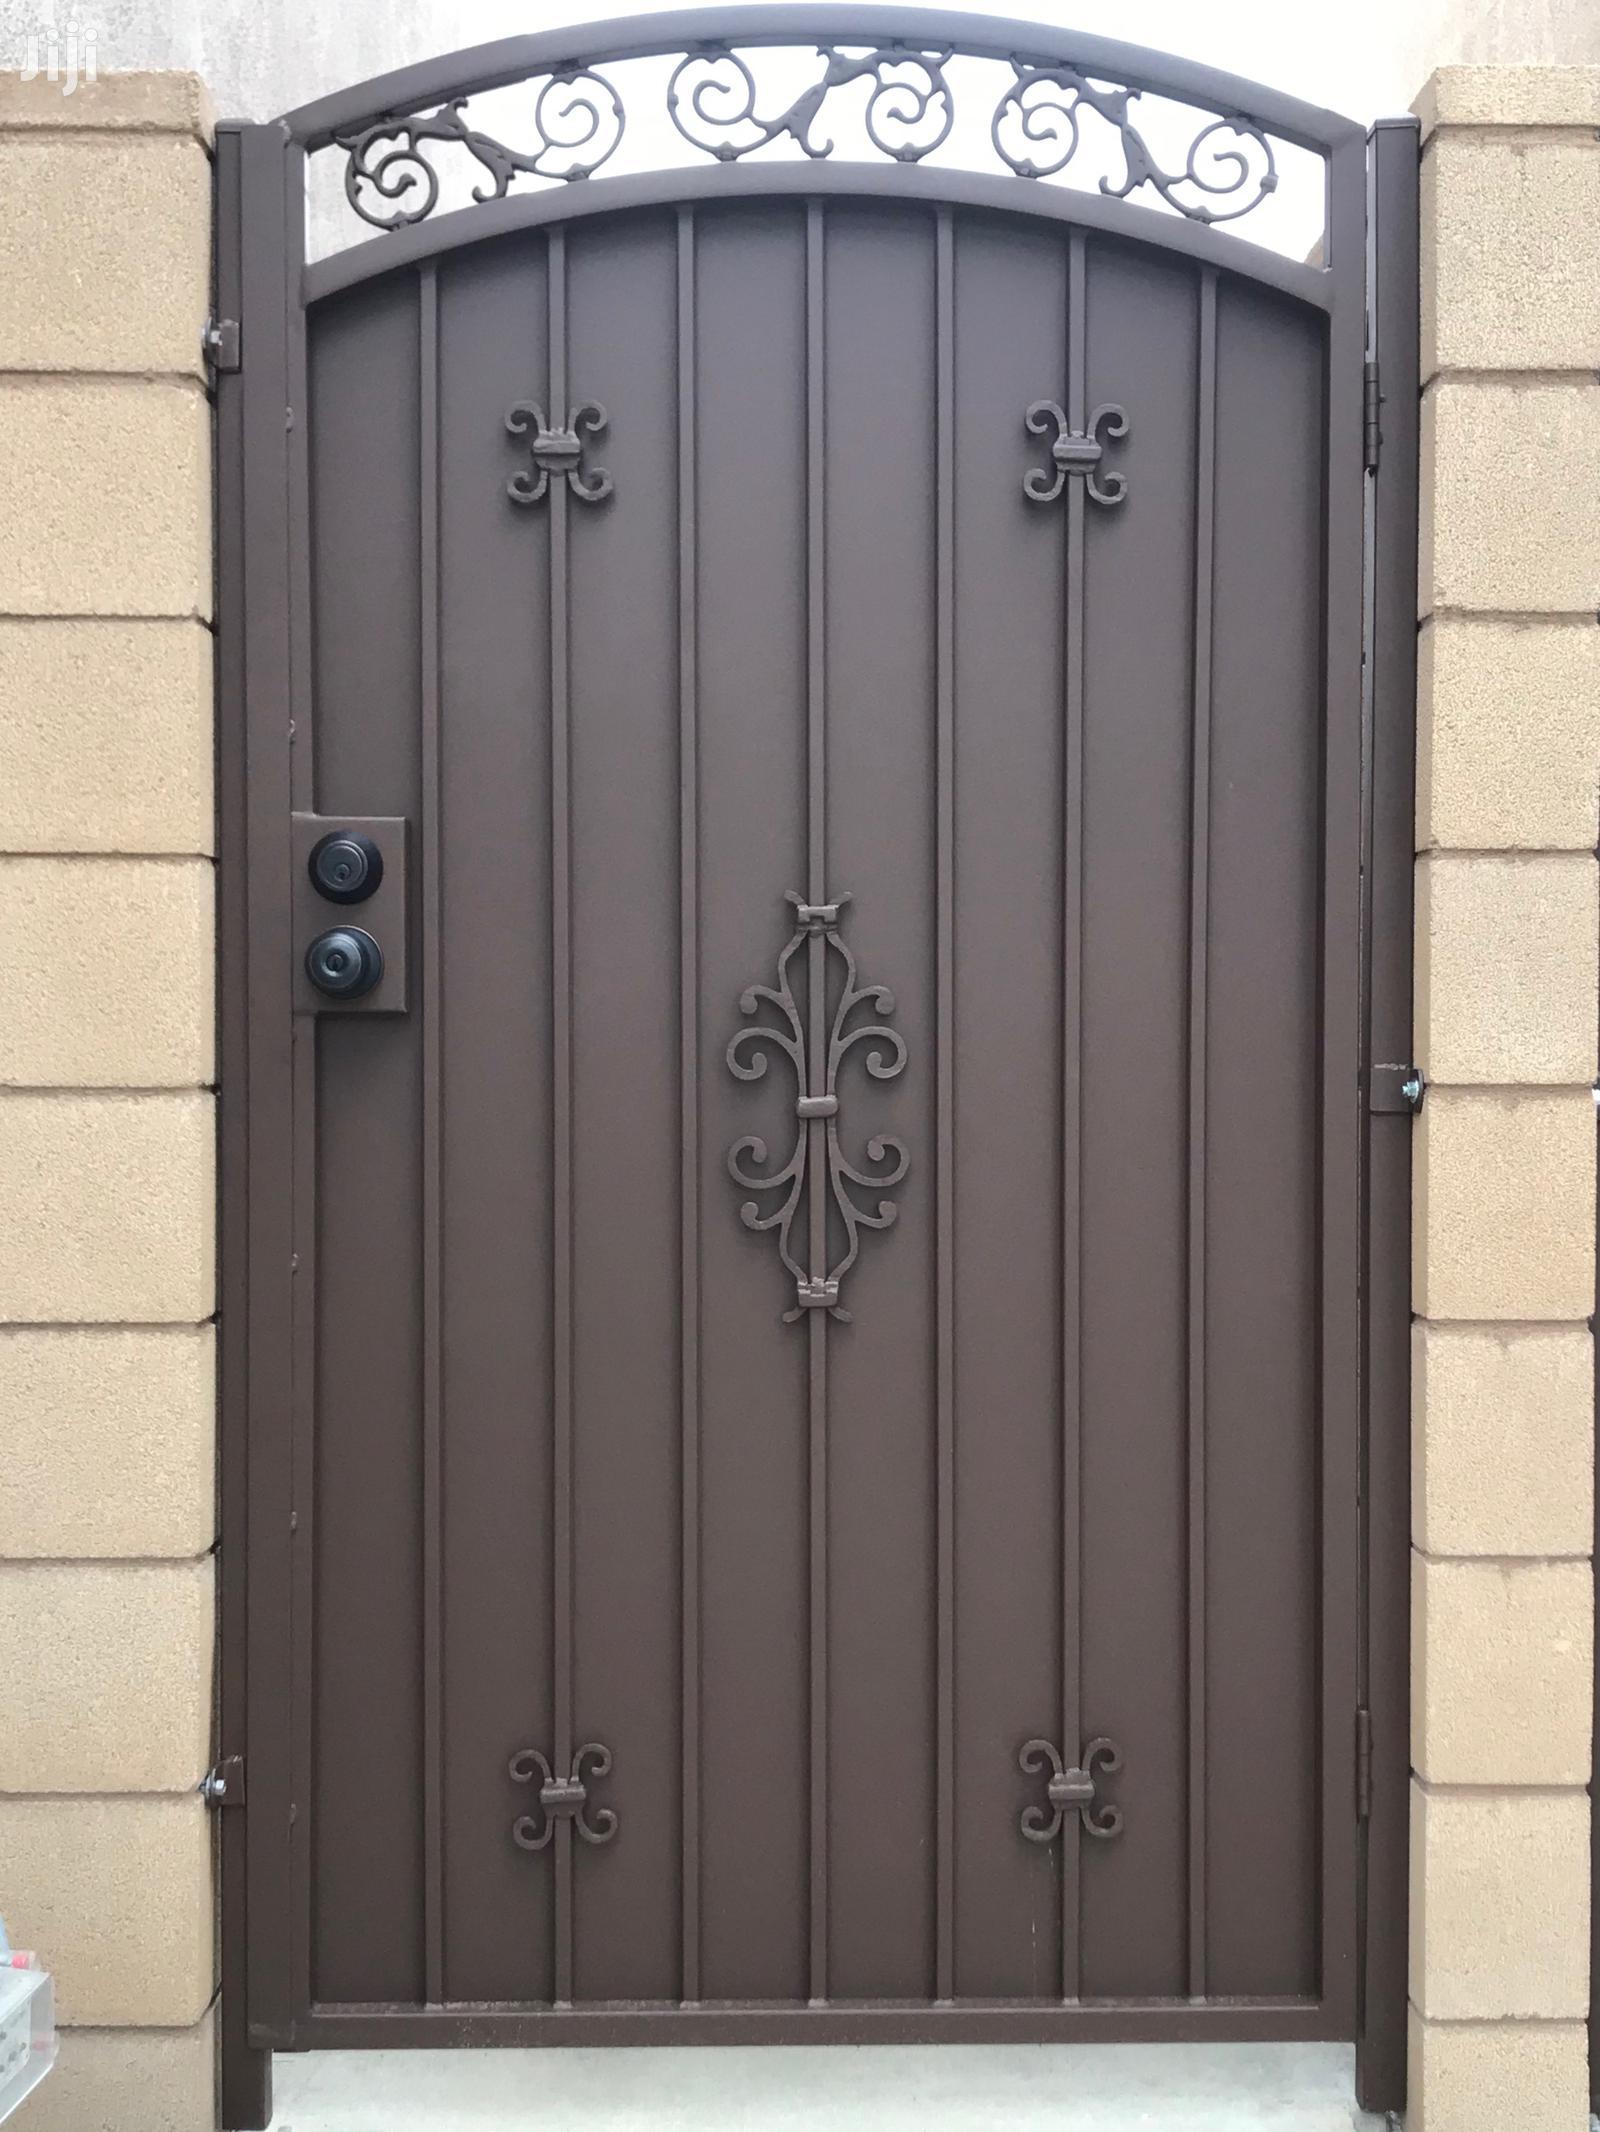 Wrought Iron Special Doors | Doors for sale in Kampala, Central Region, Uganda